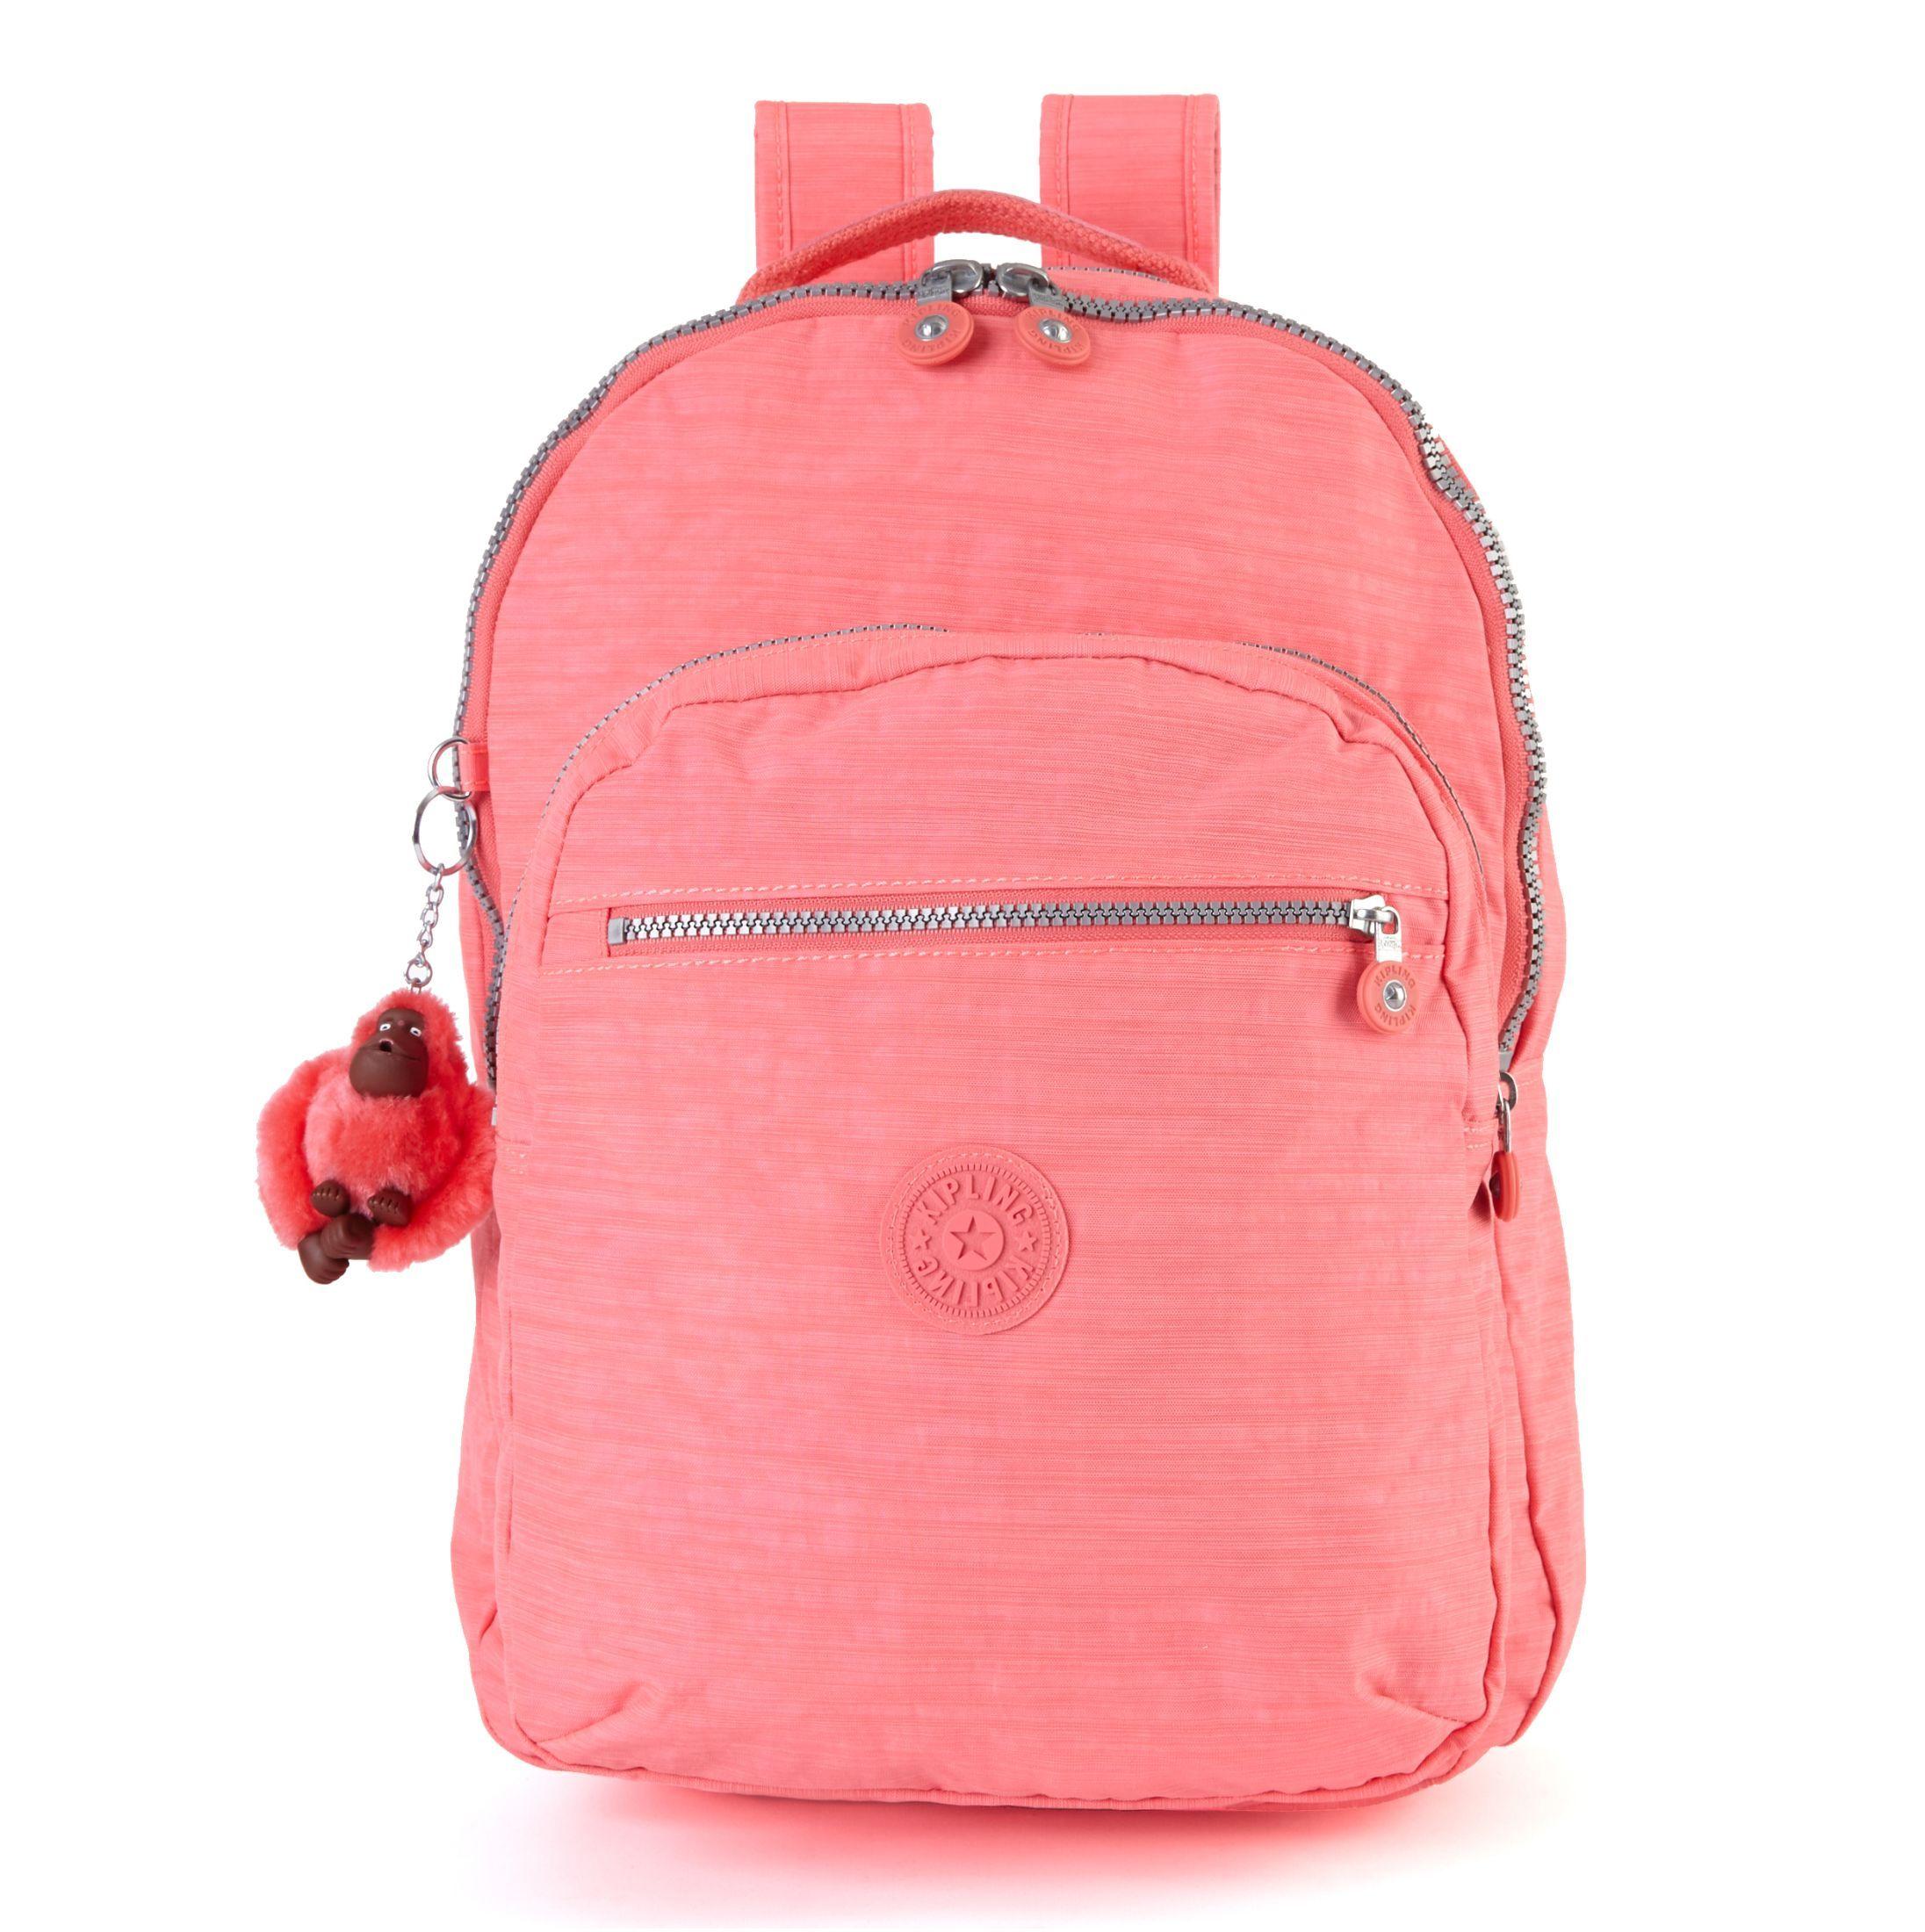 0145b05db Seoul Large Laptop Backpack   mochilas   Pinterest